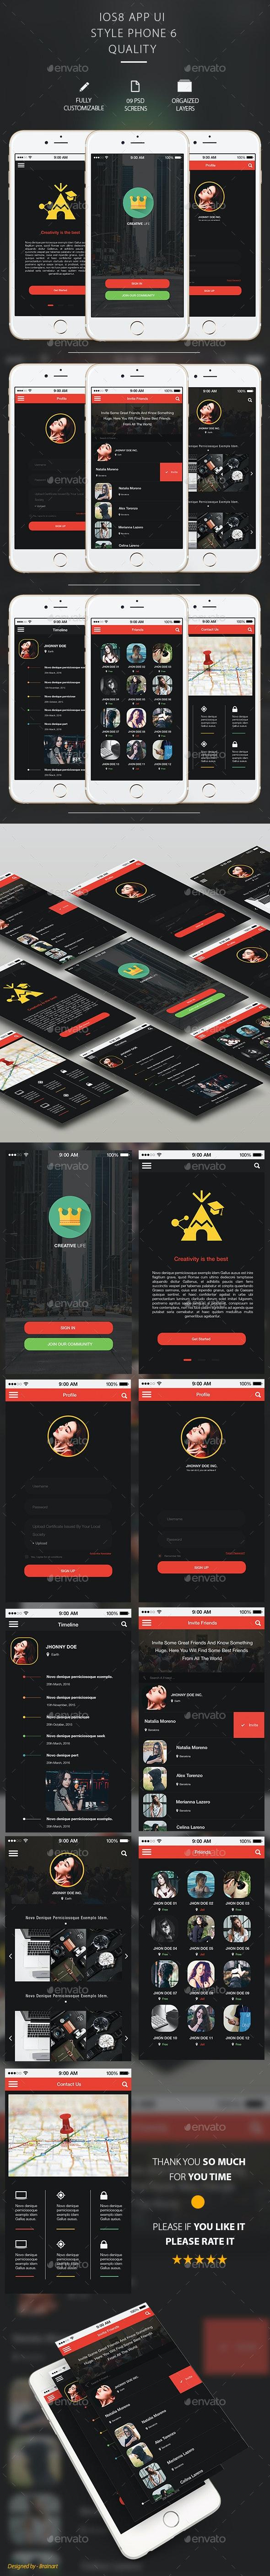 Creativelife Flat Mobile App UI  - User Interfaces Web Elements